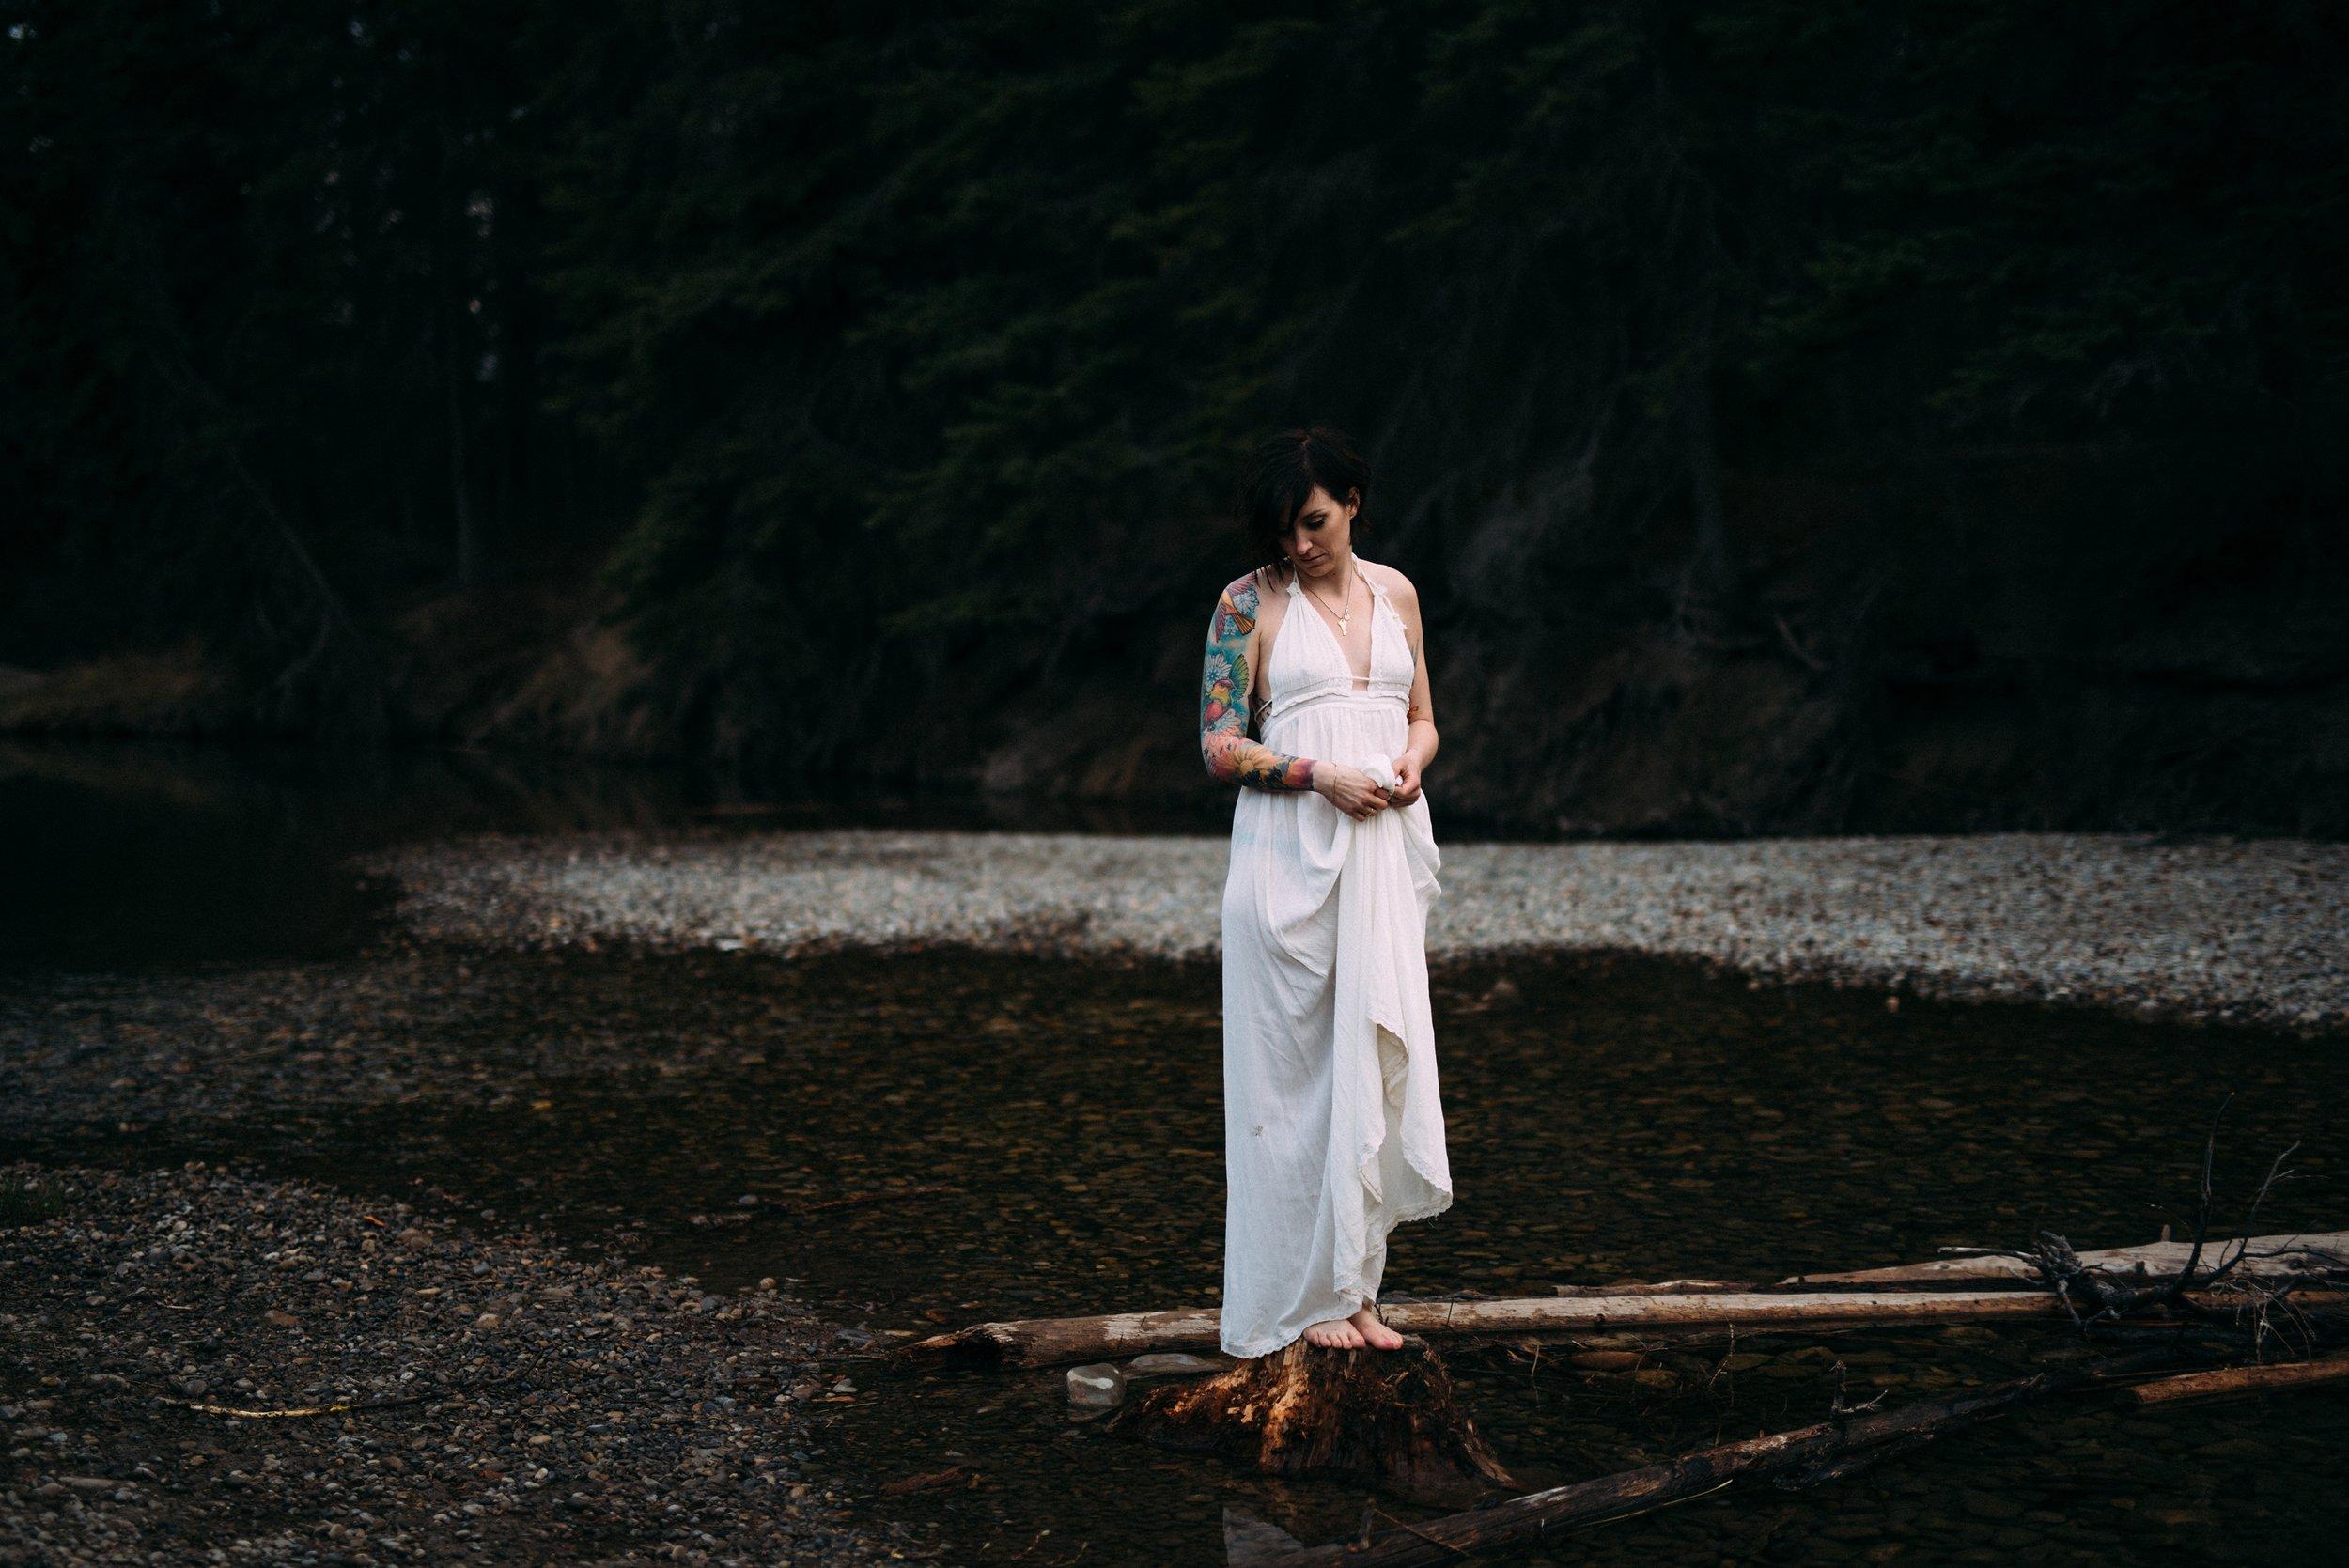 kaihla_tonai_intimate_wedding_elopement_photographer_3778